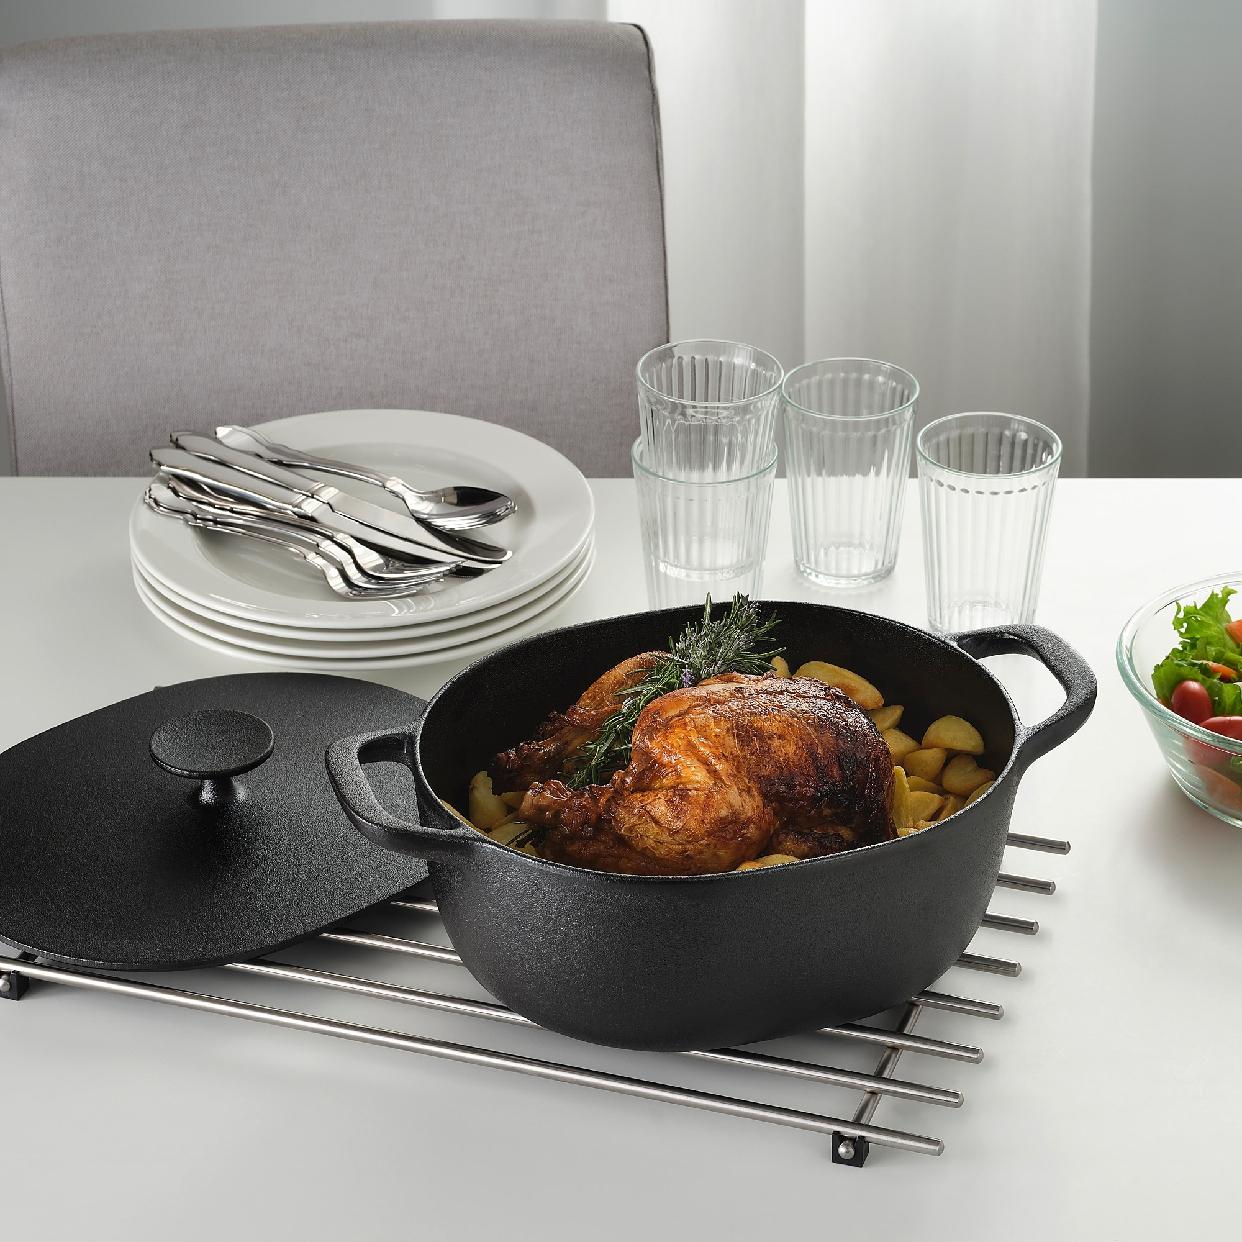 IKEA(イケア) ヴァルダーゲン キャセロール鍋の商品画像3